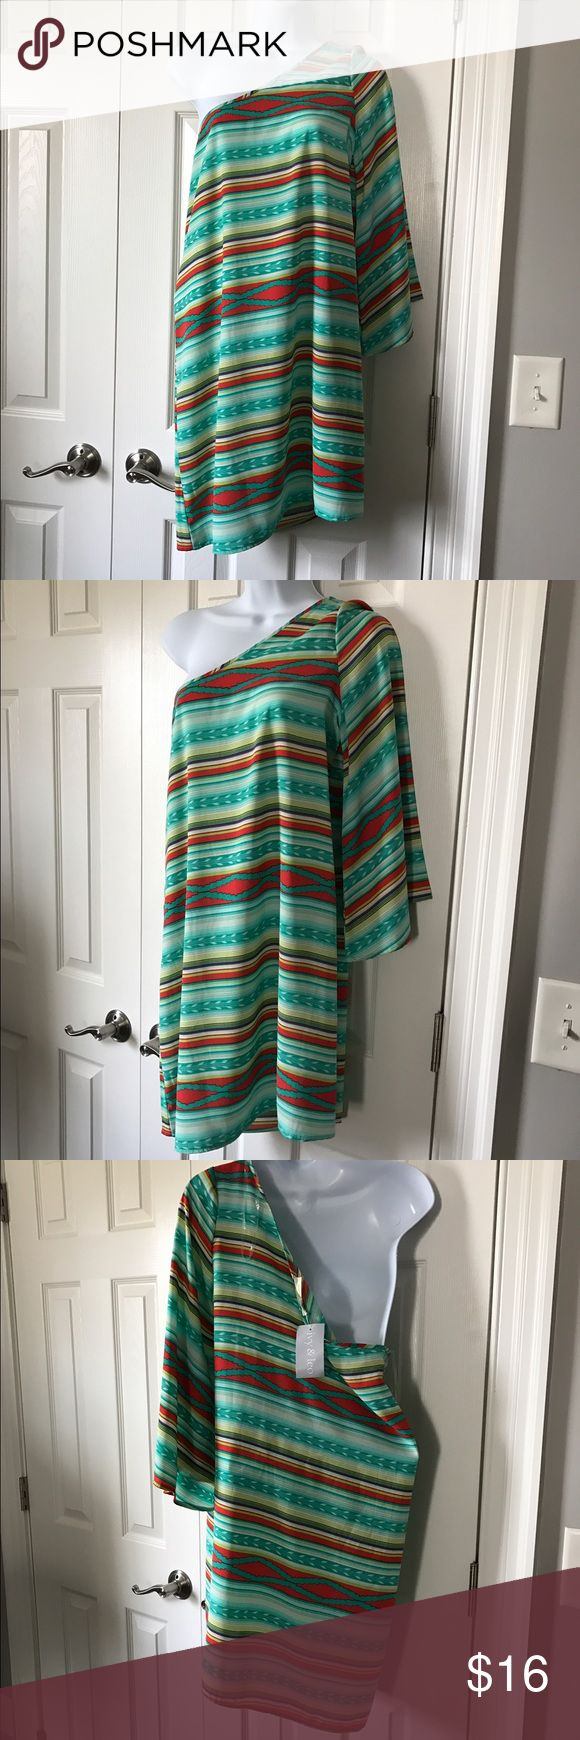 NWT Newbury Kustom dress, medium New with tags, purchased from boutique newbury kustom Dresses One Shoulder